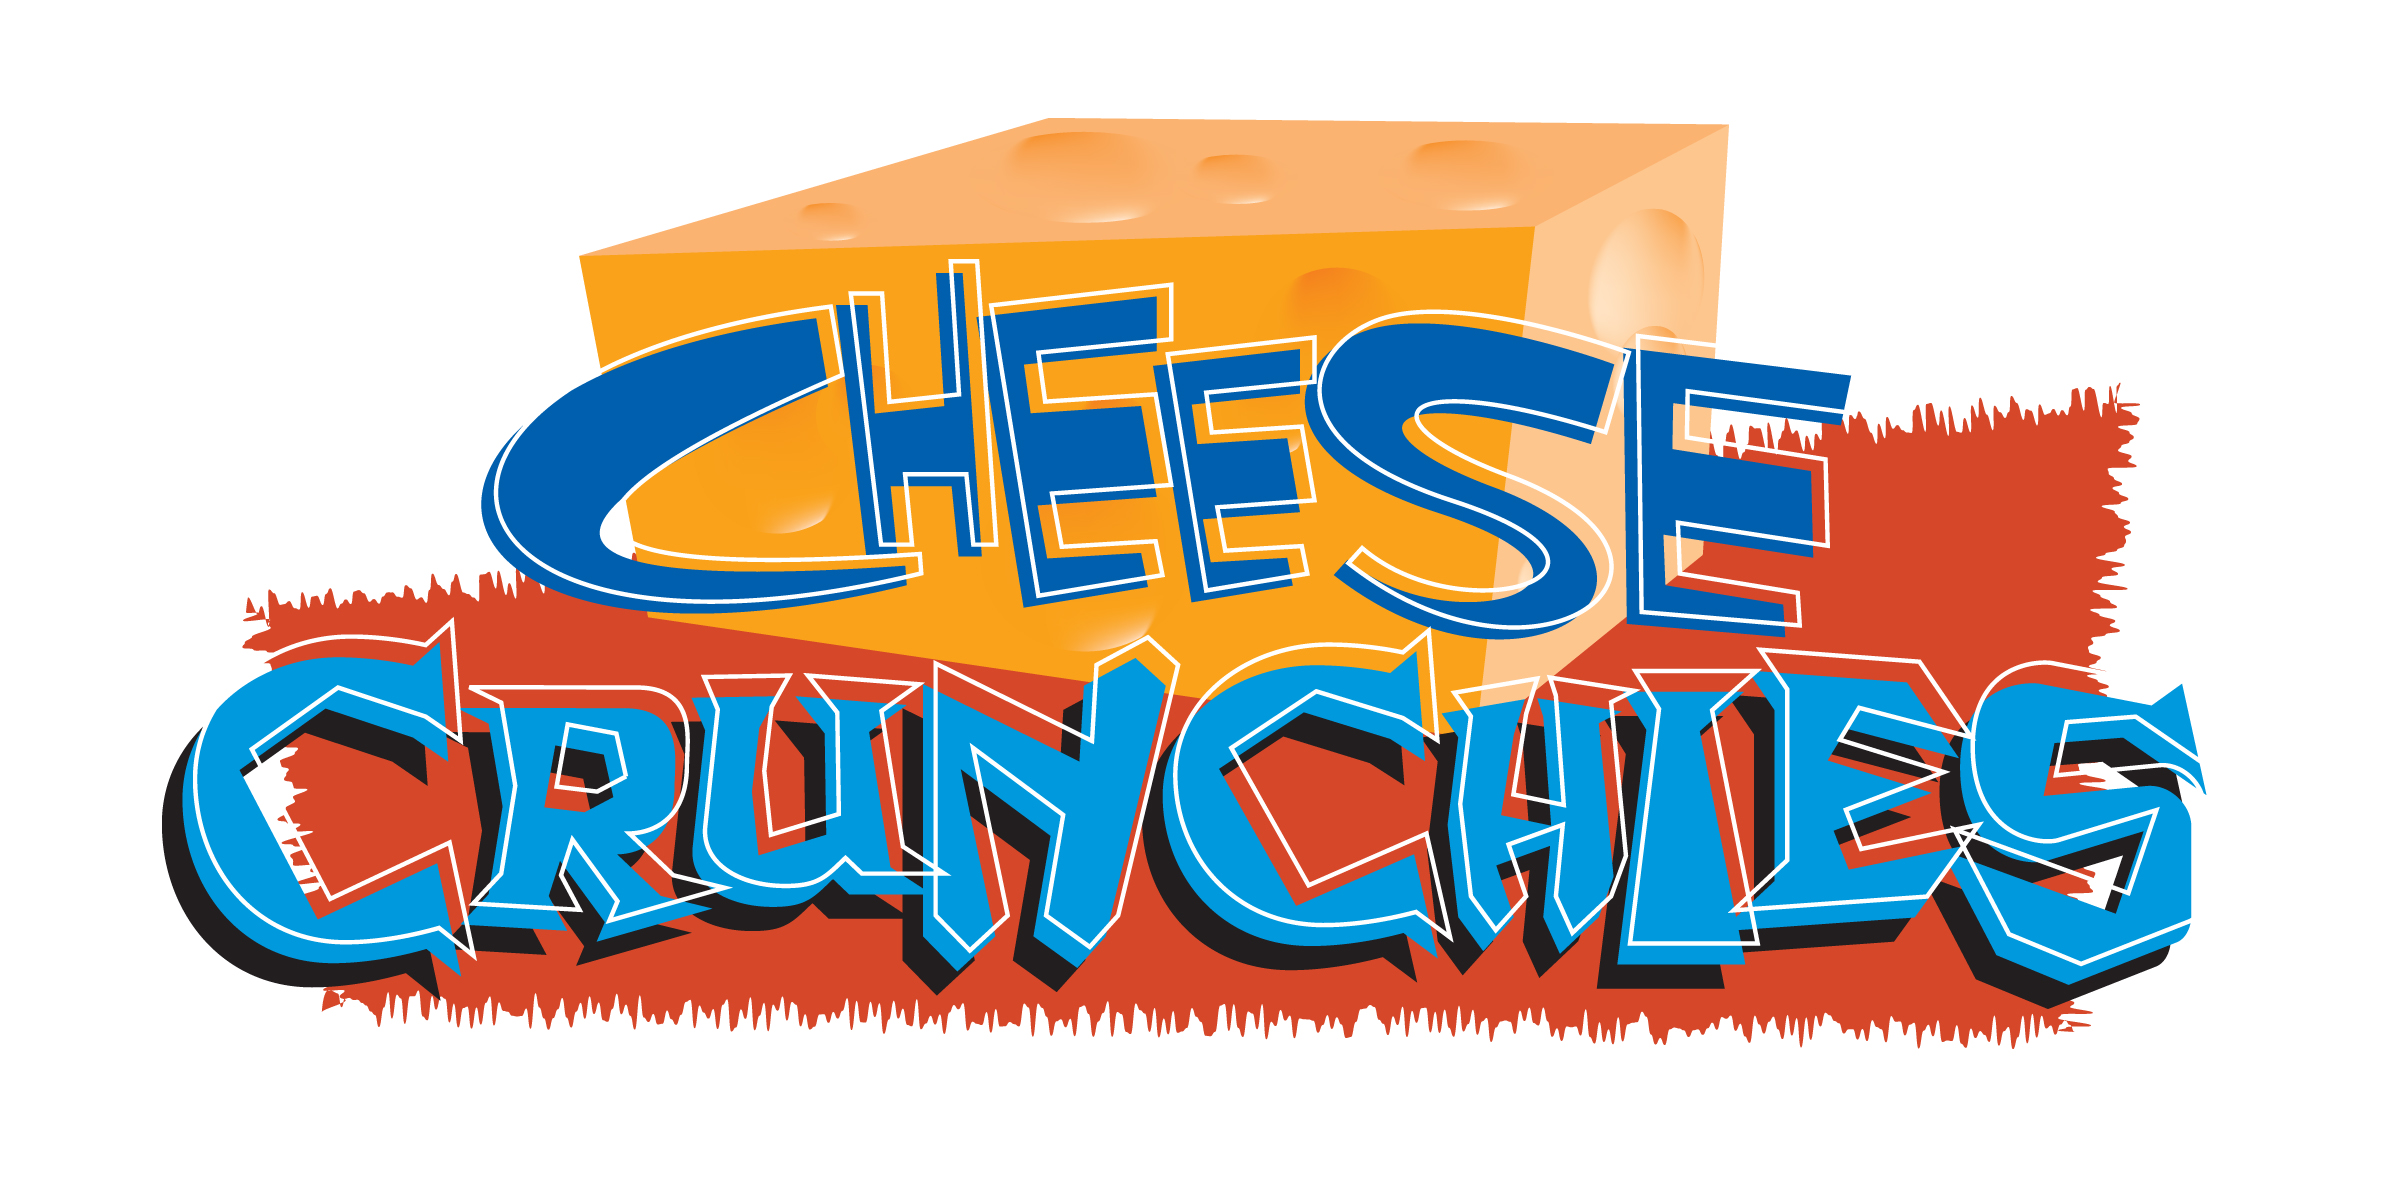 cheesecrunchies